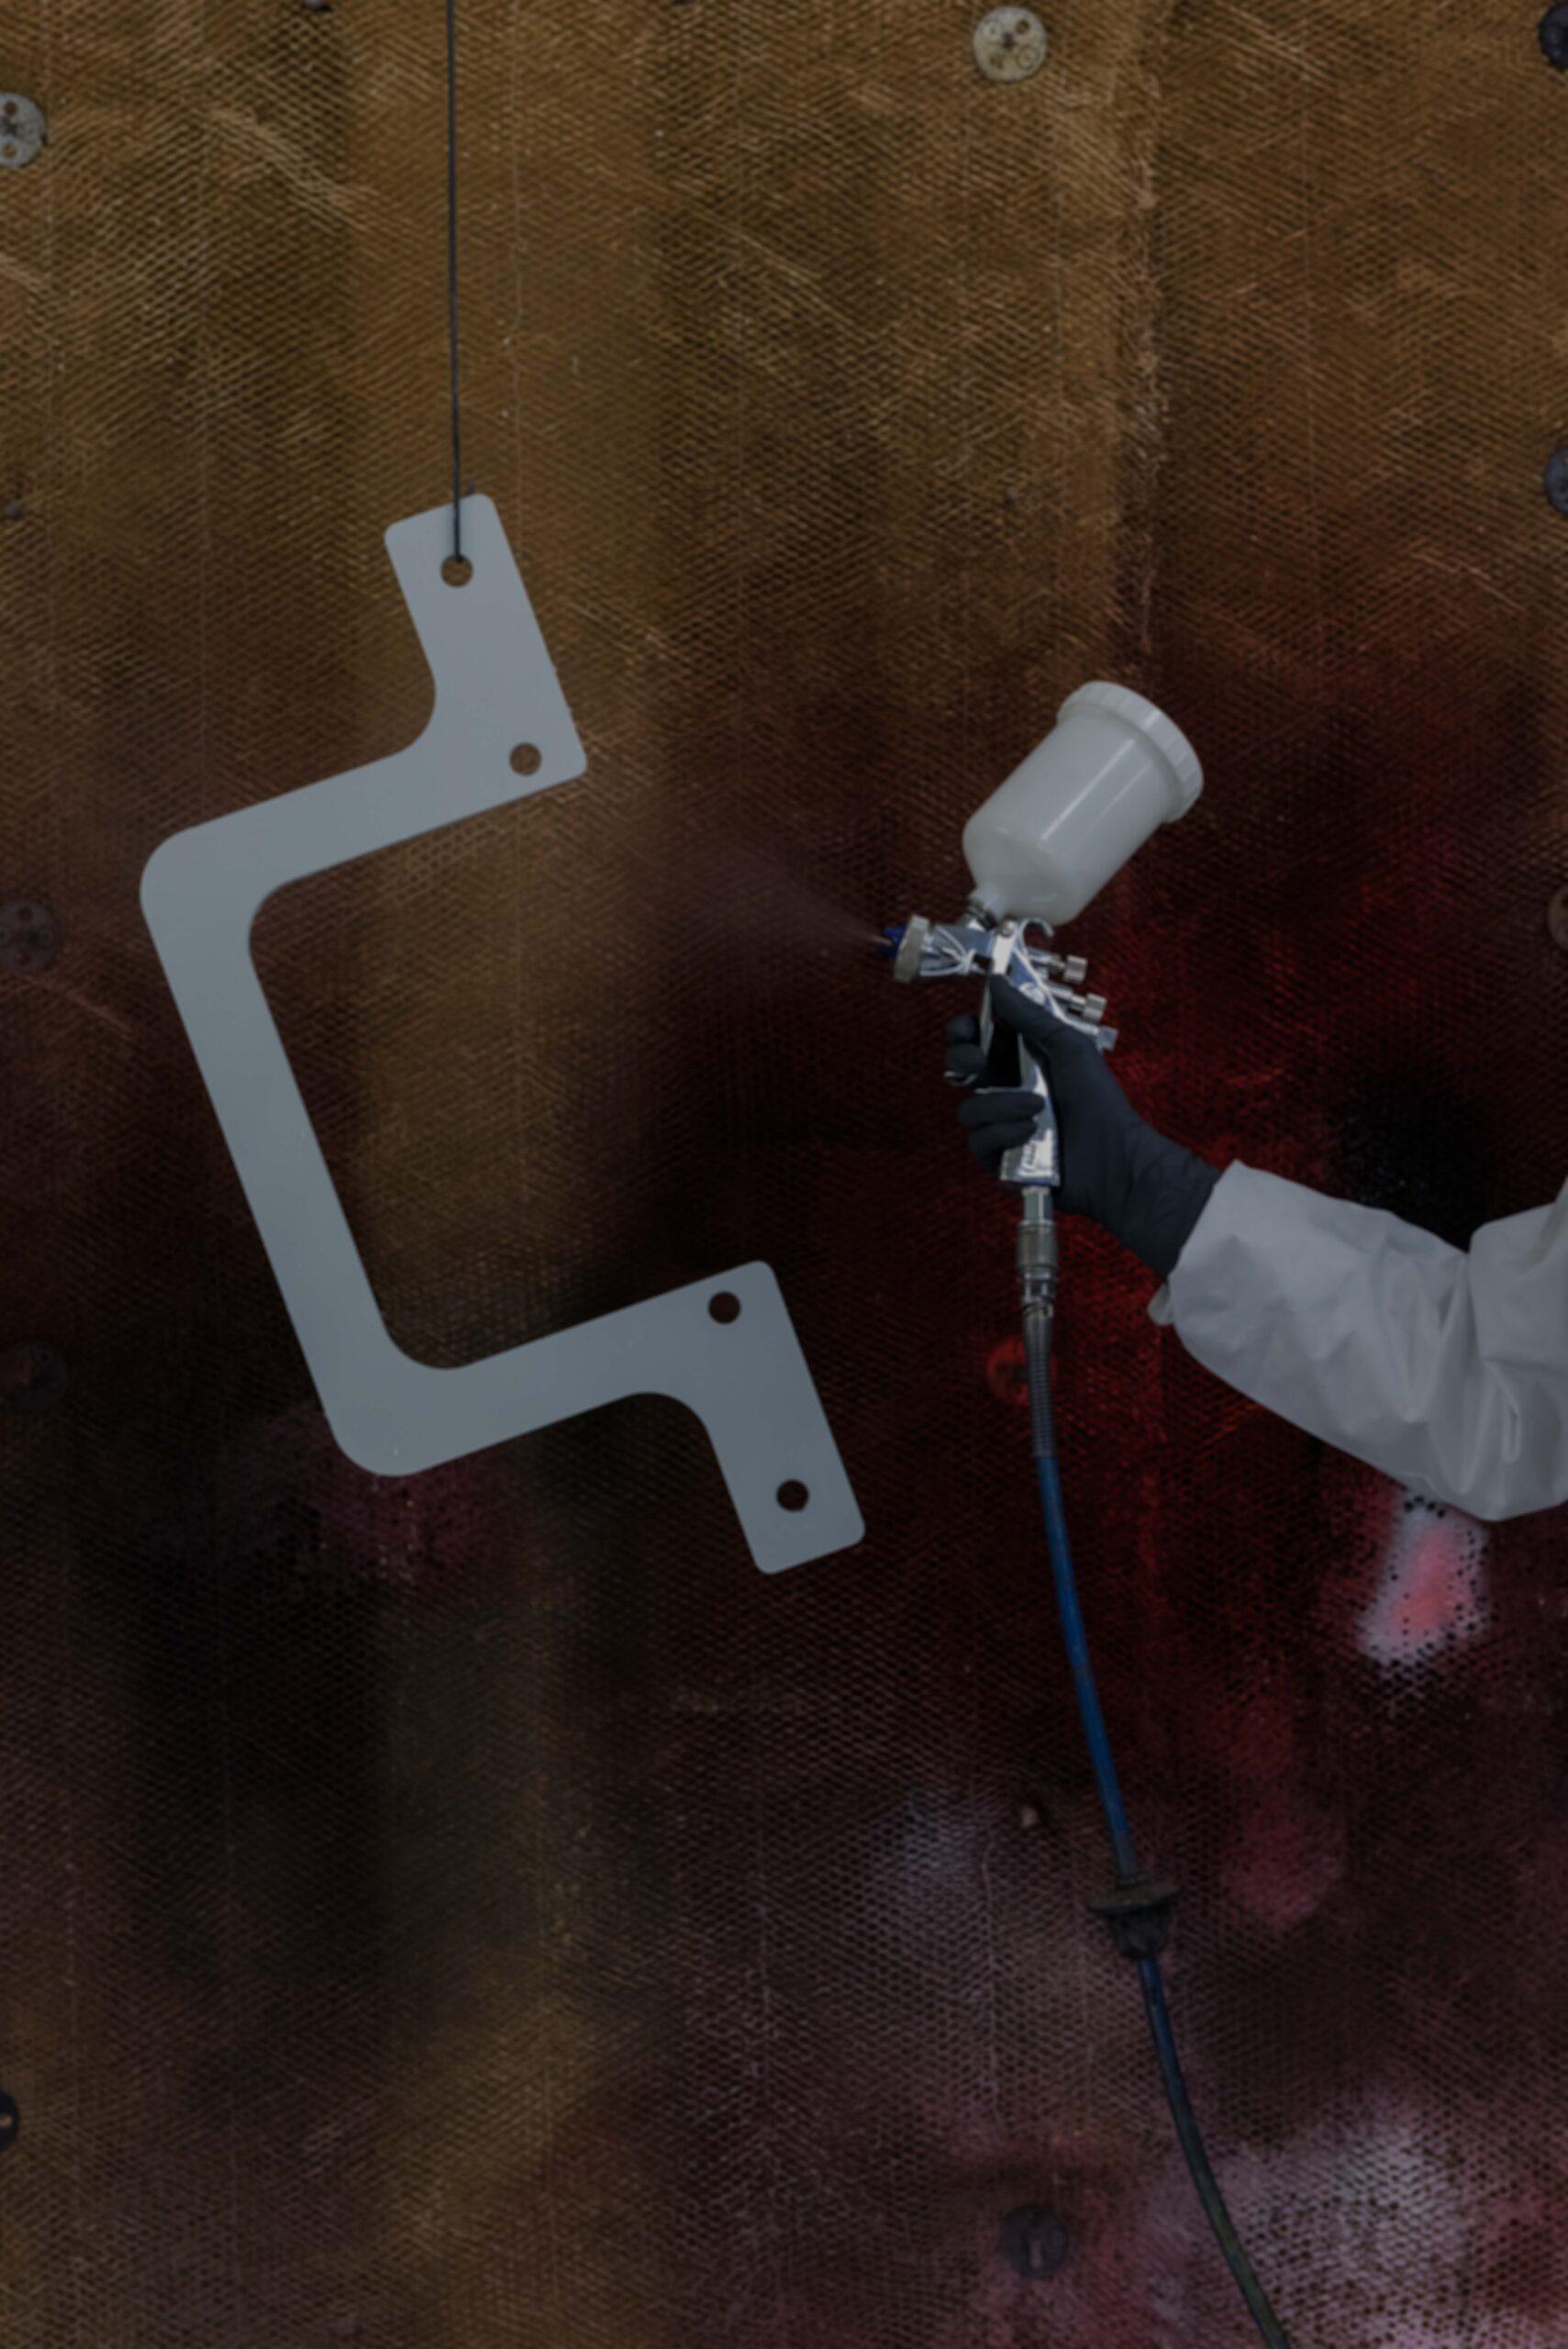 Walther Pilot Premium Handheld Industrial Spray Gun